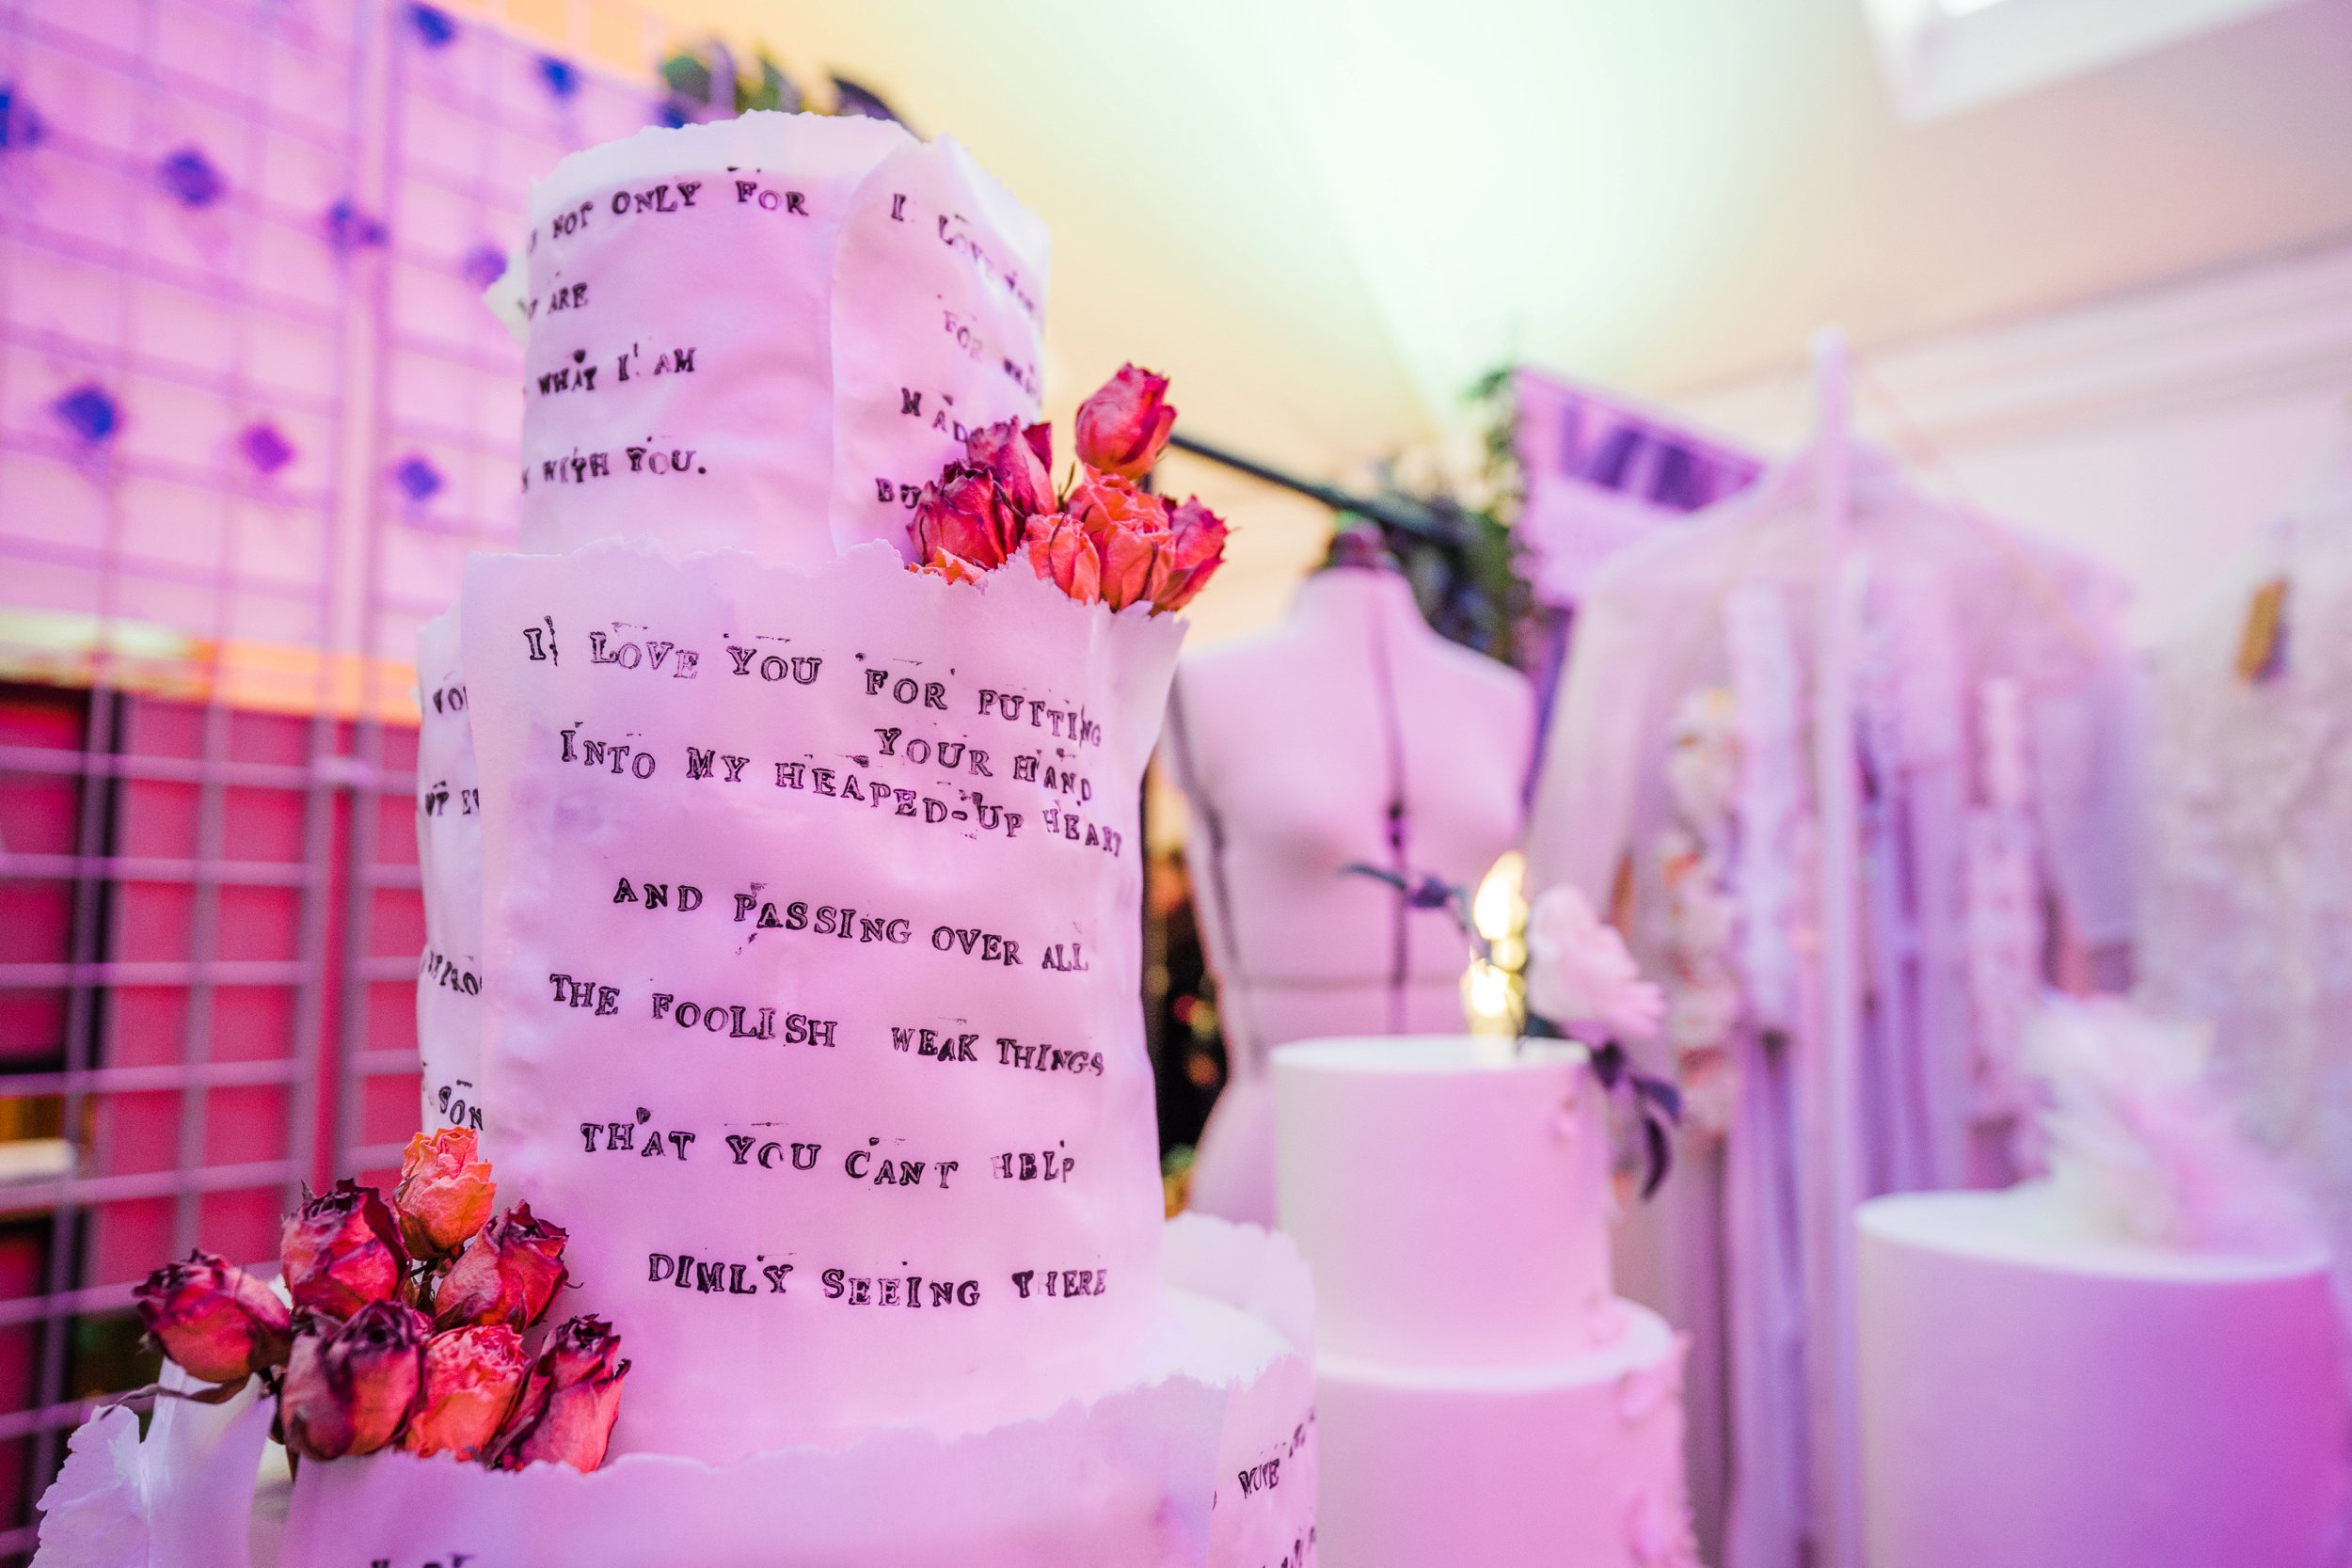 The UN-WEDDING SHOW 2019 cool bride style modern wedding fair London Core Clapton 00036.jpg